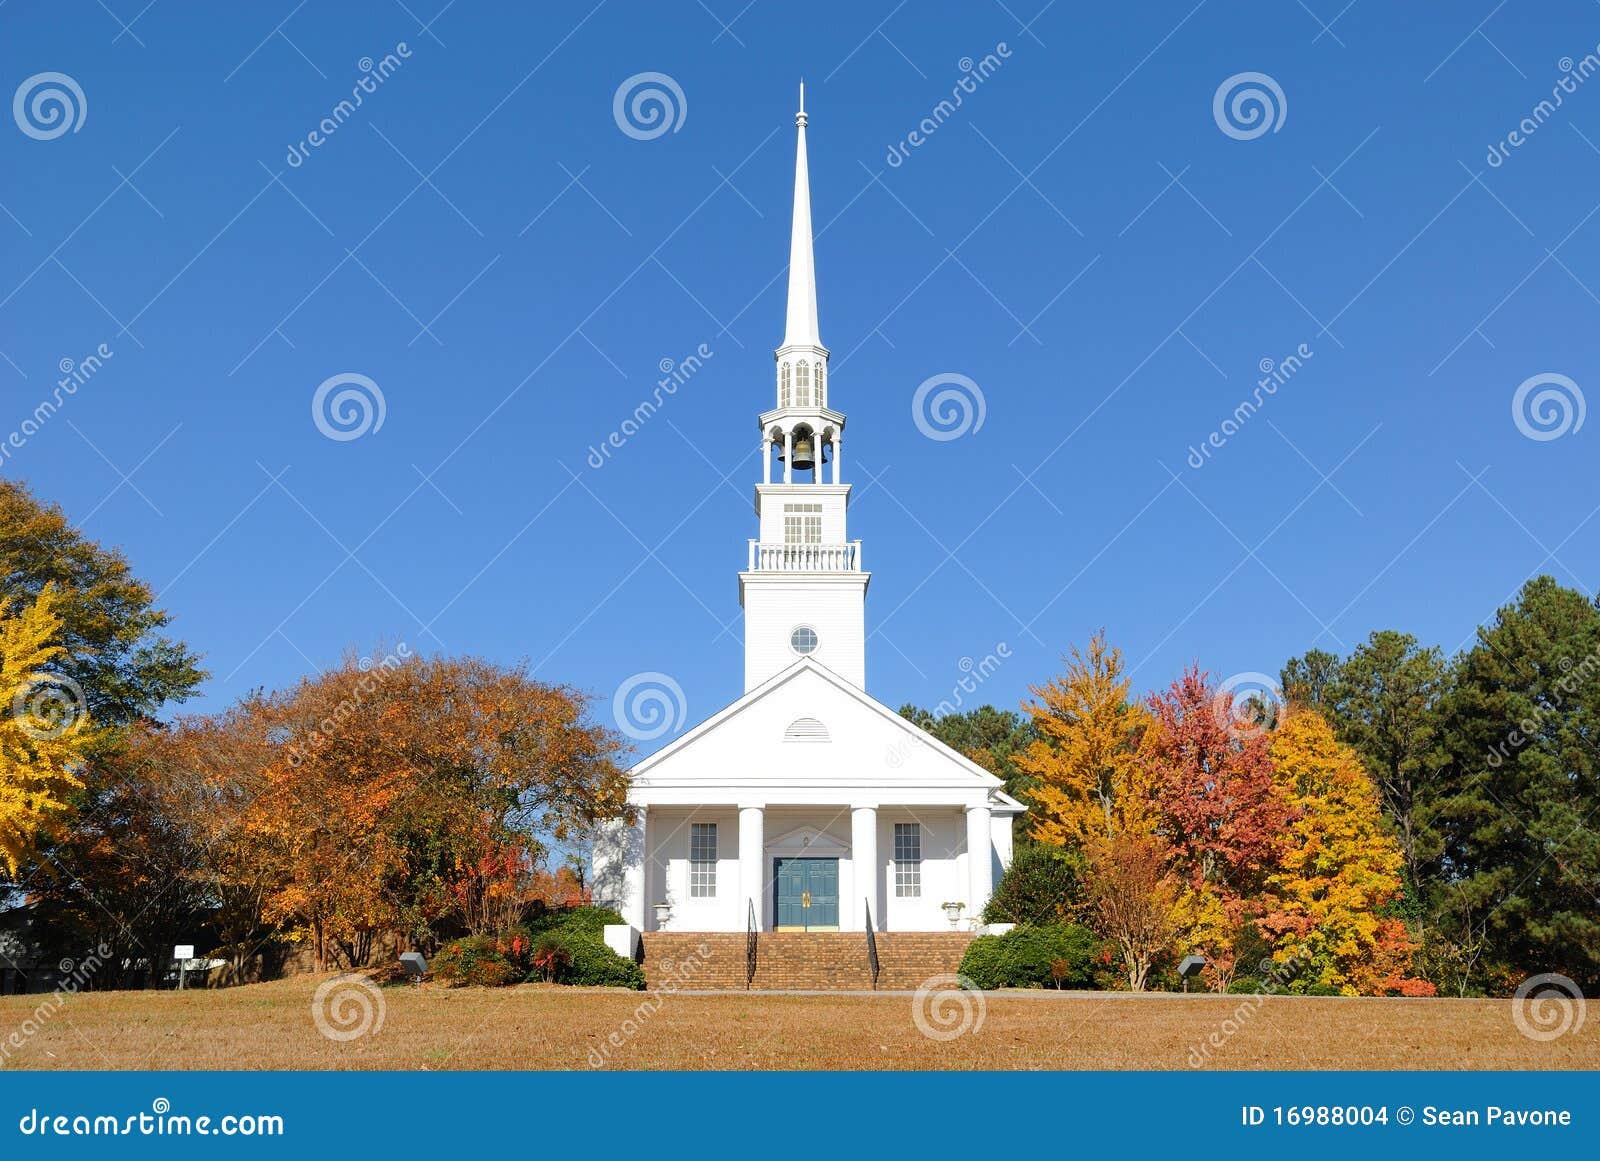 церковь баптиста